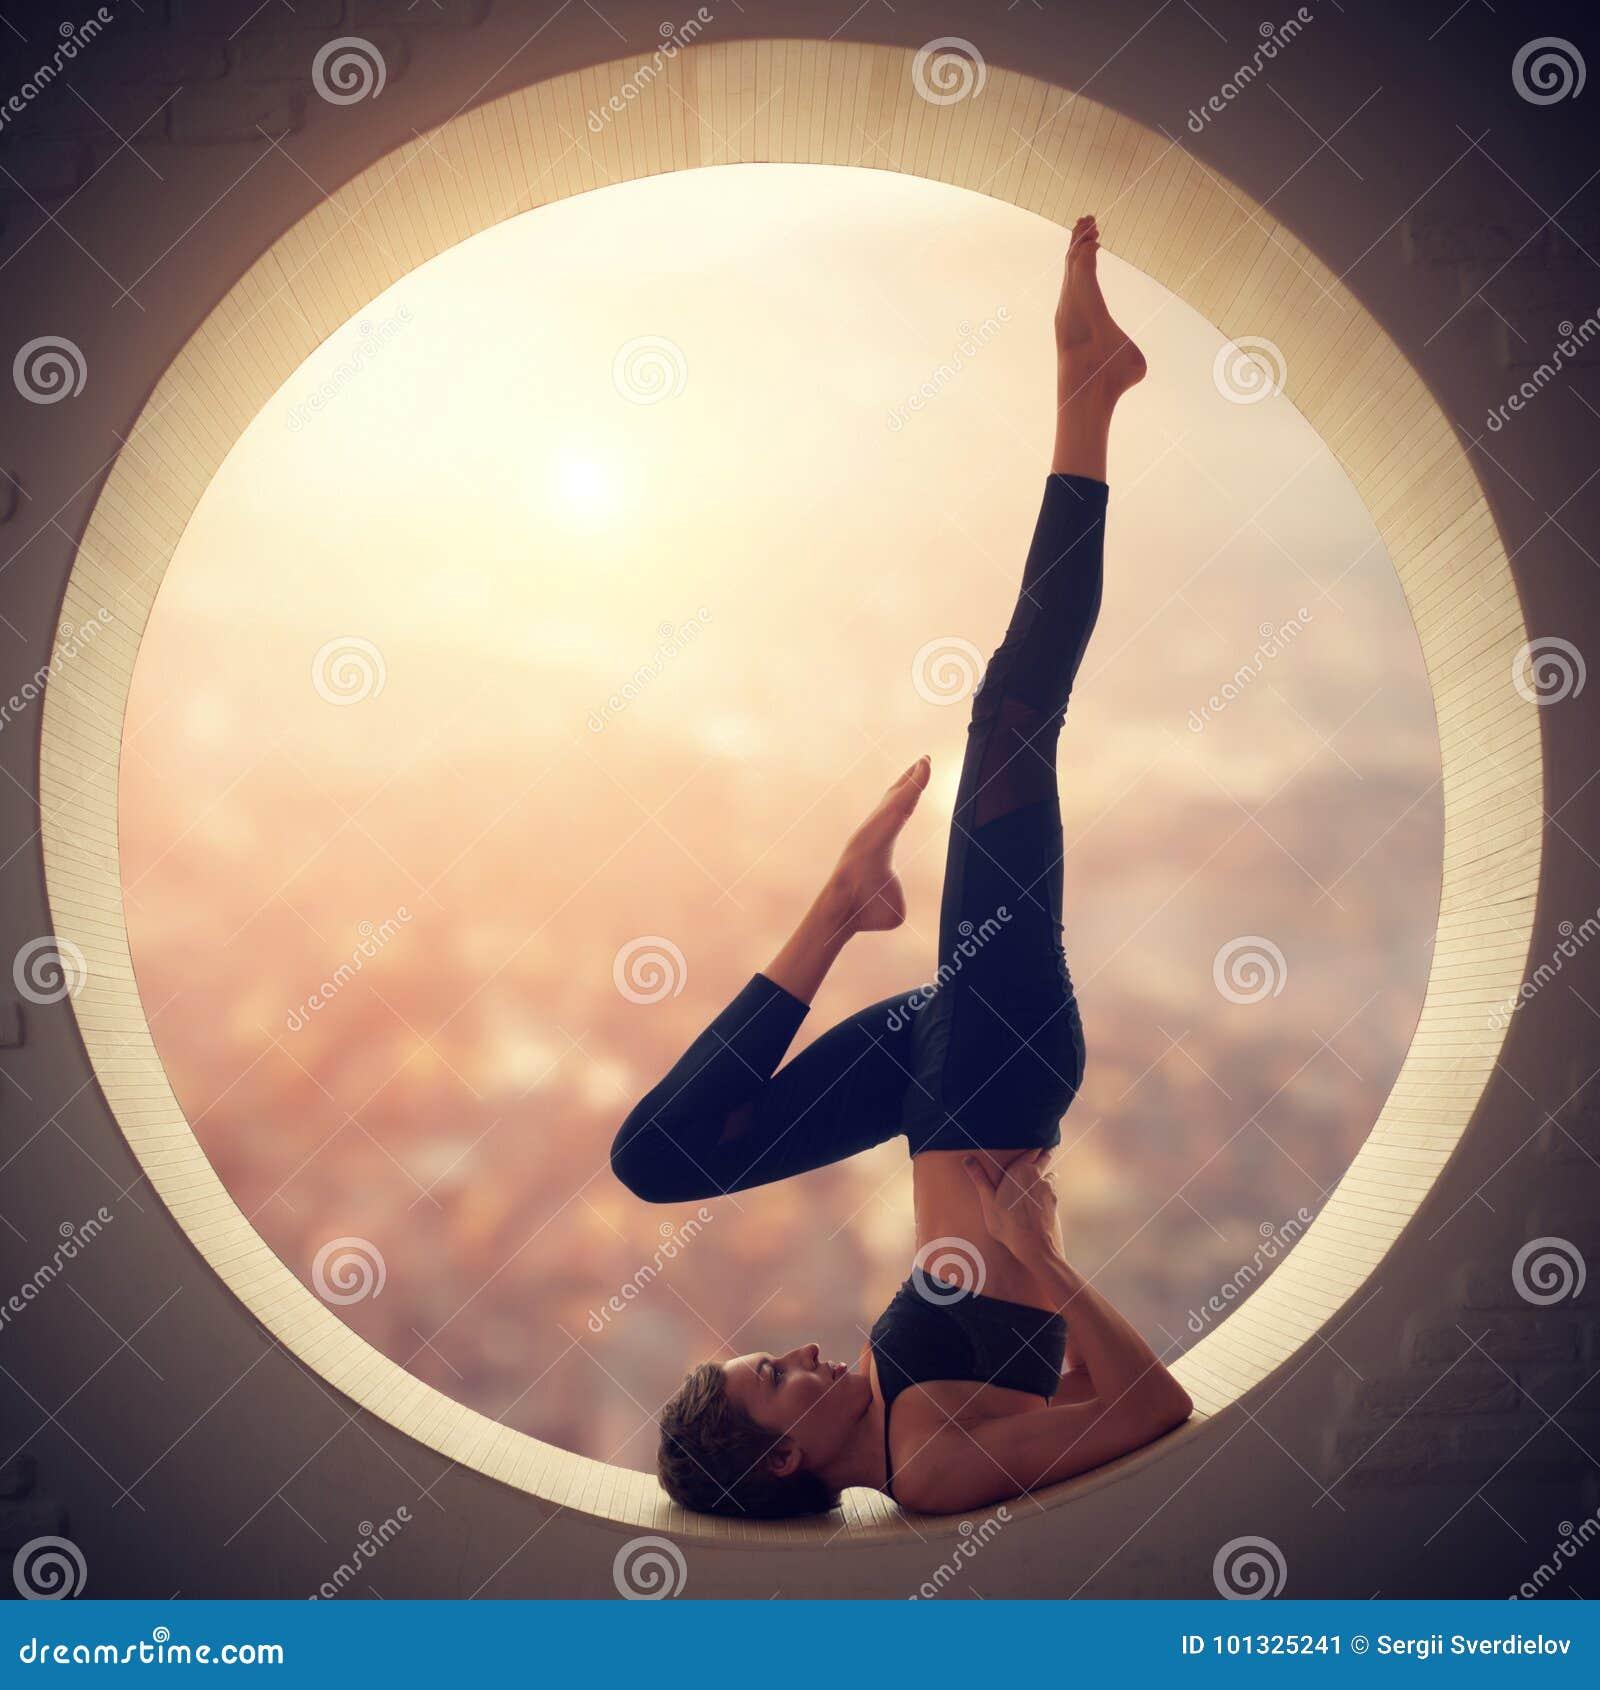 Beautiful sporty fit yogi woman practices yoga Salamba Sarvangasana - shoulderstand pose in a window